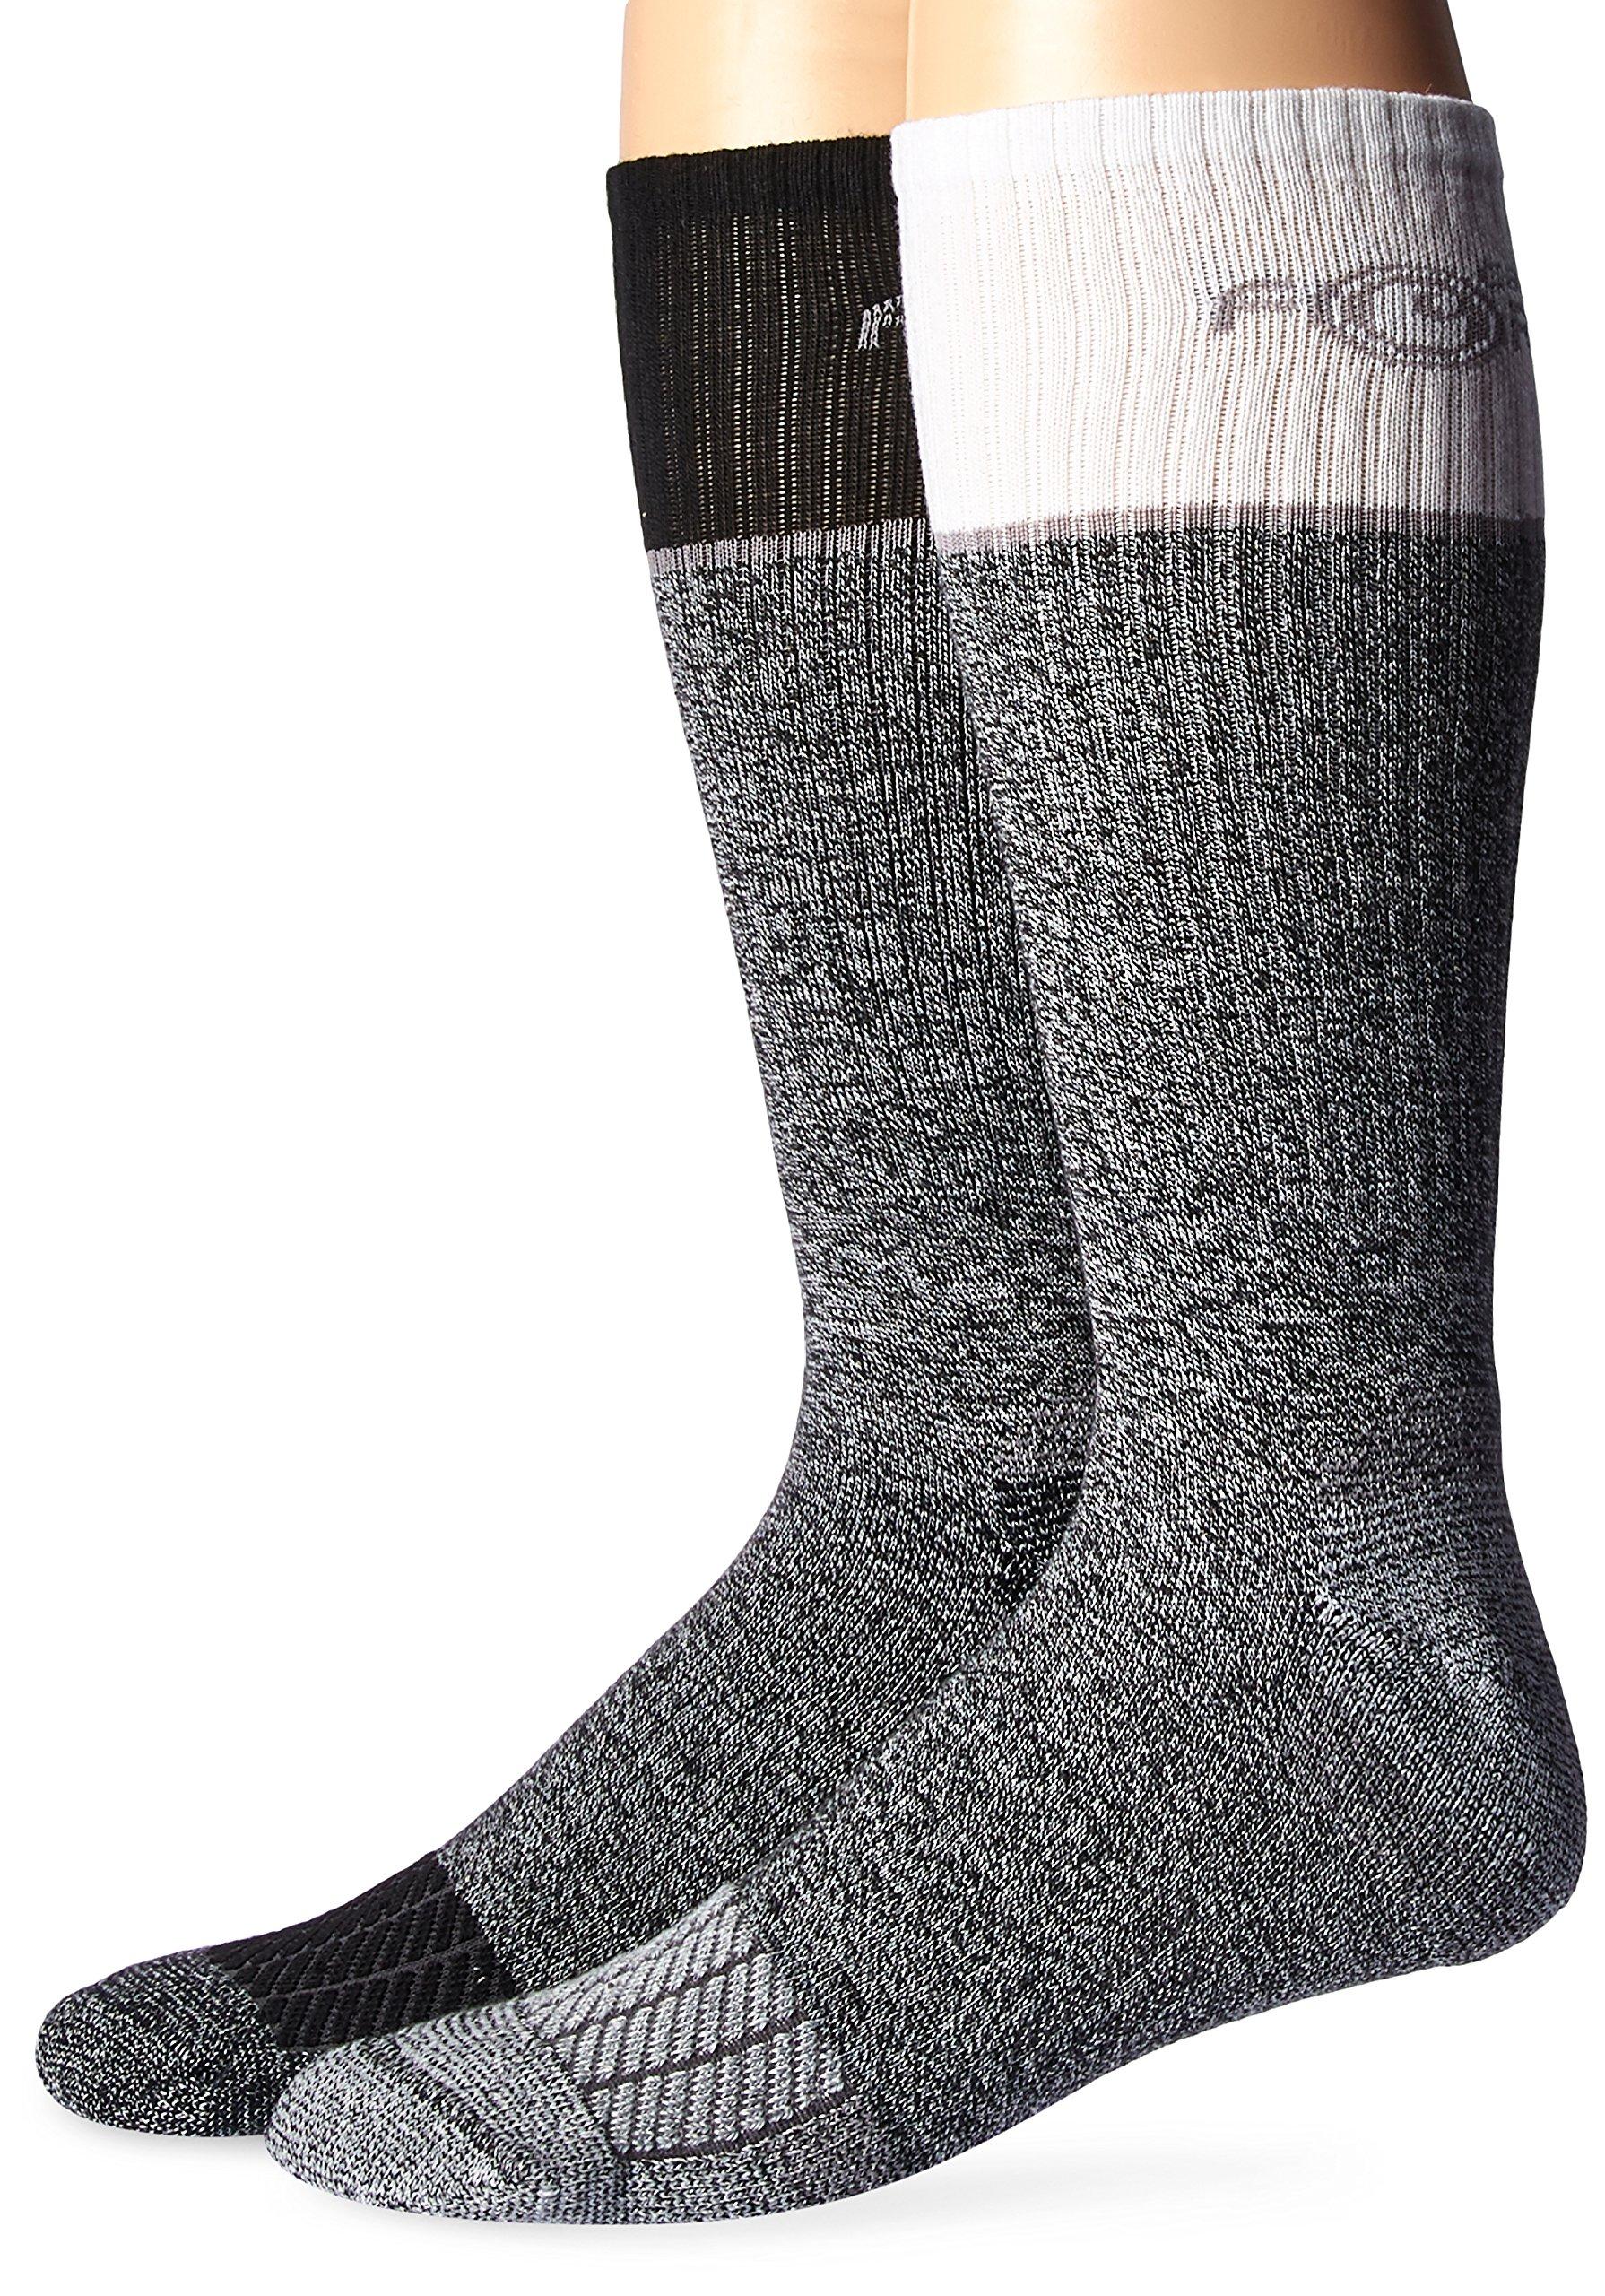 Carhartt Men's Big and Tall Force Performance Steel Toe Crew Socks-2 Pair, Grey, Black, White, Shoe Size: 11-15 (Xlarge)